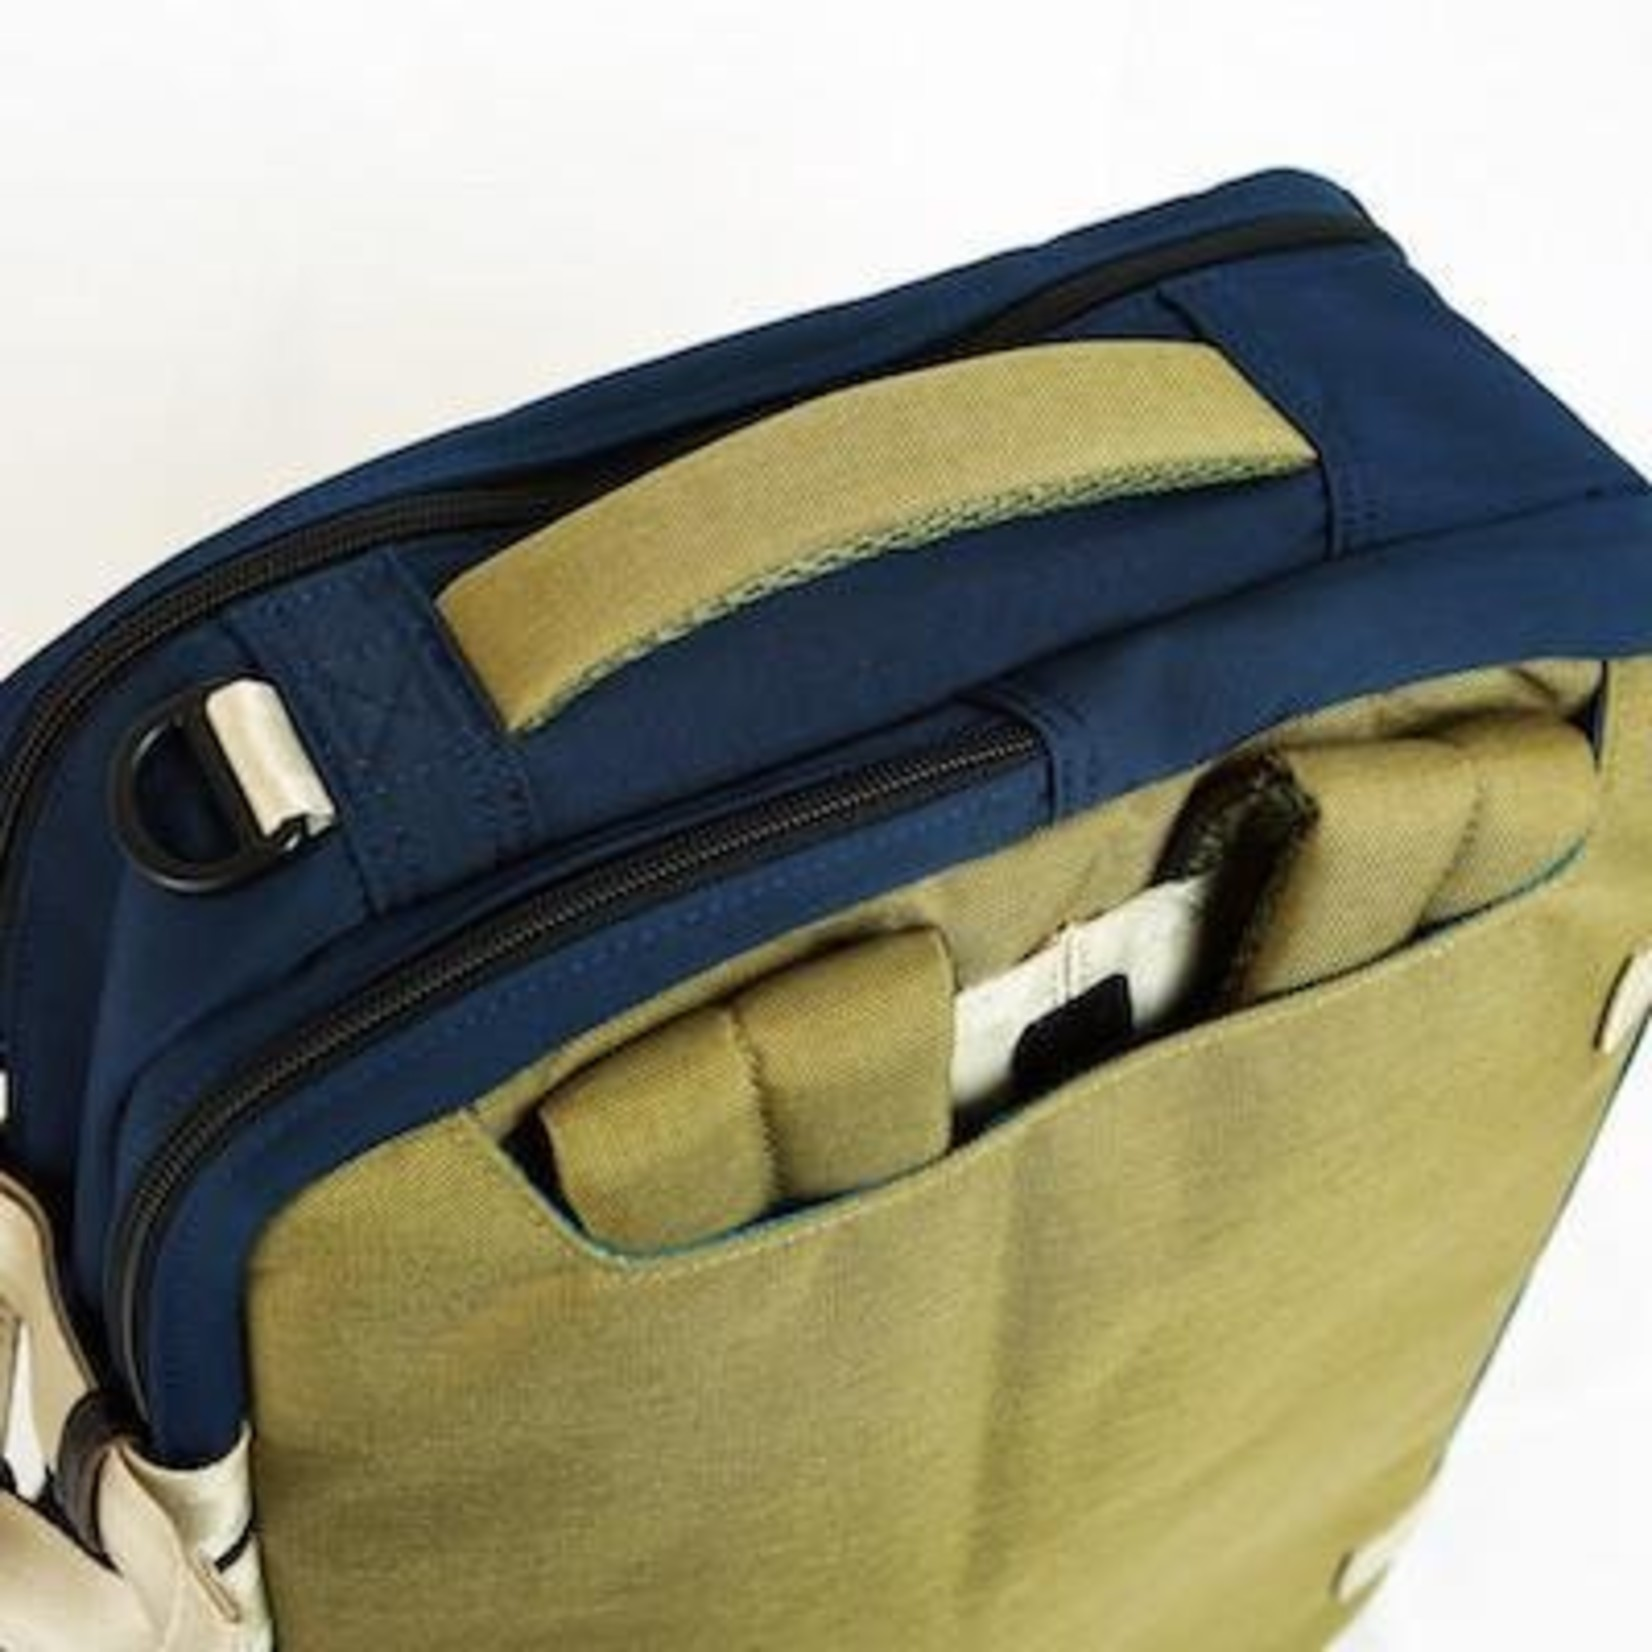 Molla Space 3 Way Traveller Pack Black/Khaki